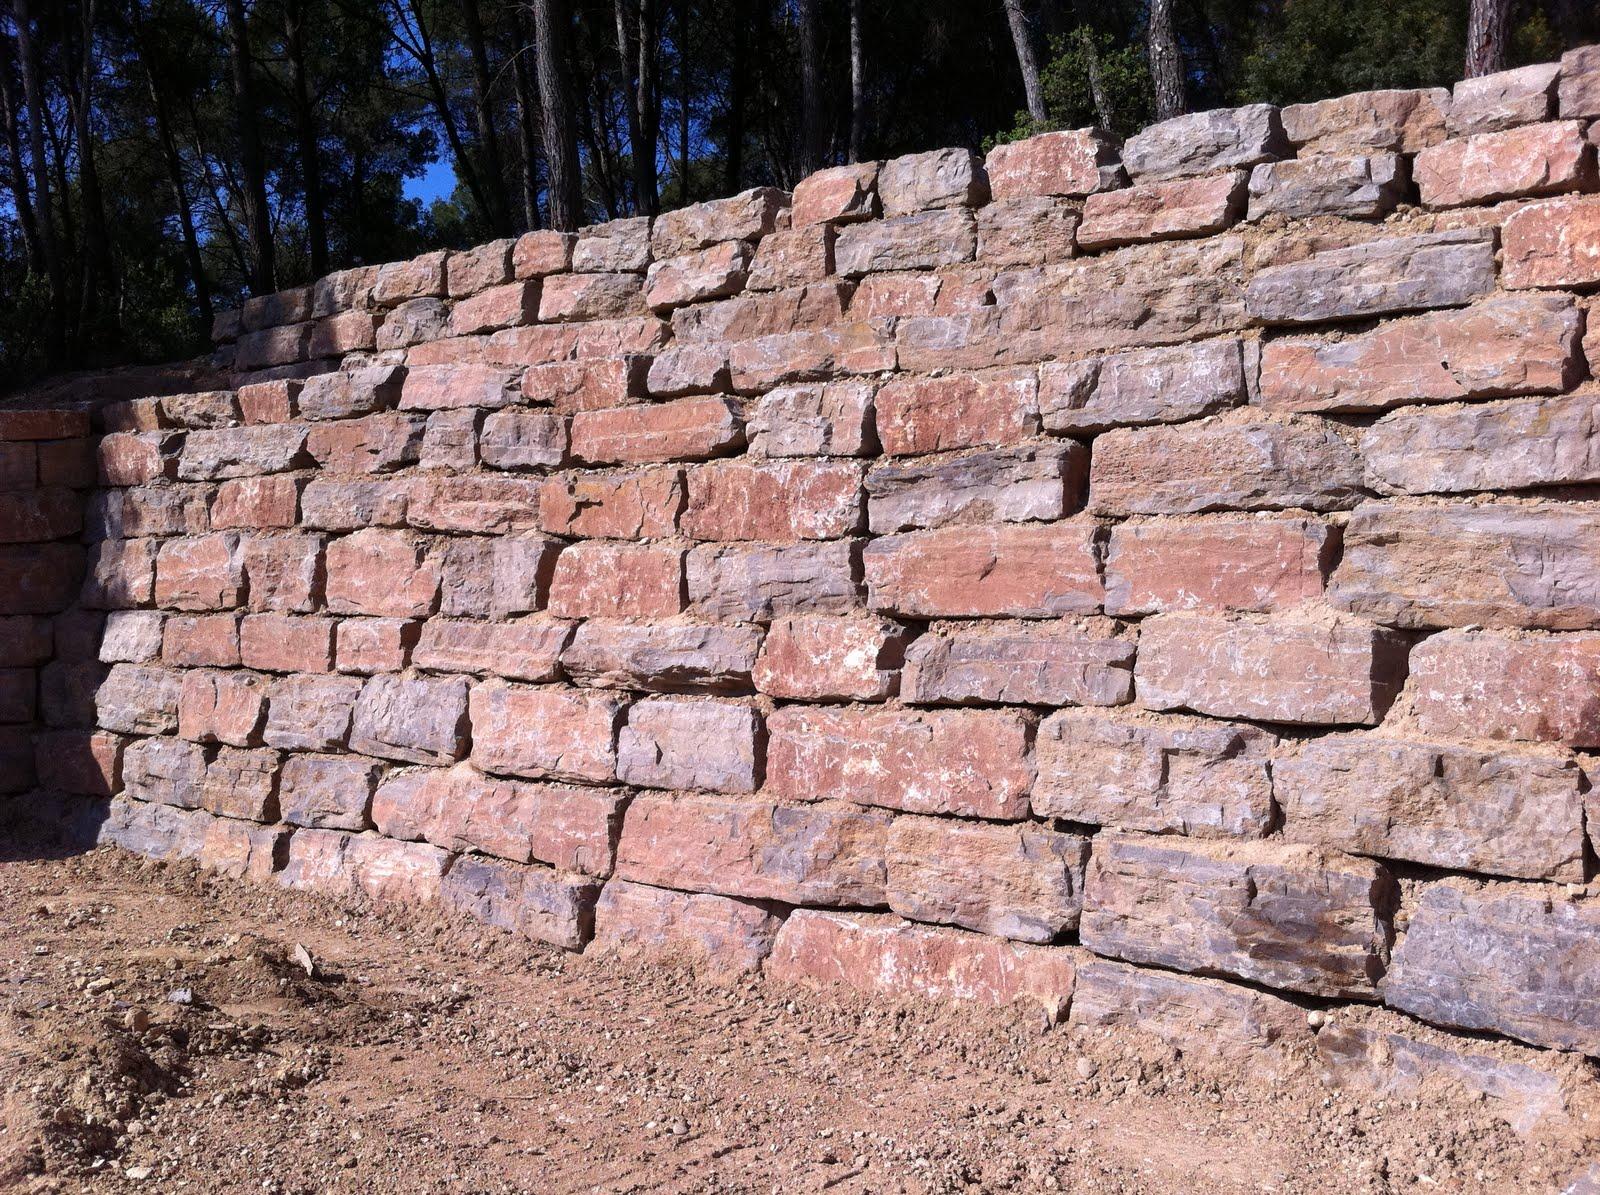 Muros de rocalla junio 2011 - Muros de rocalla ...